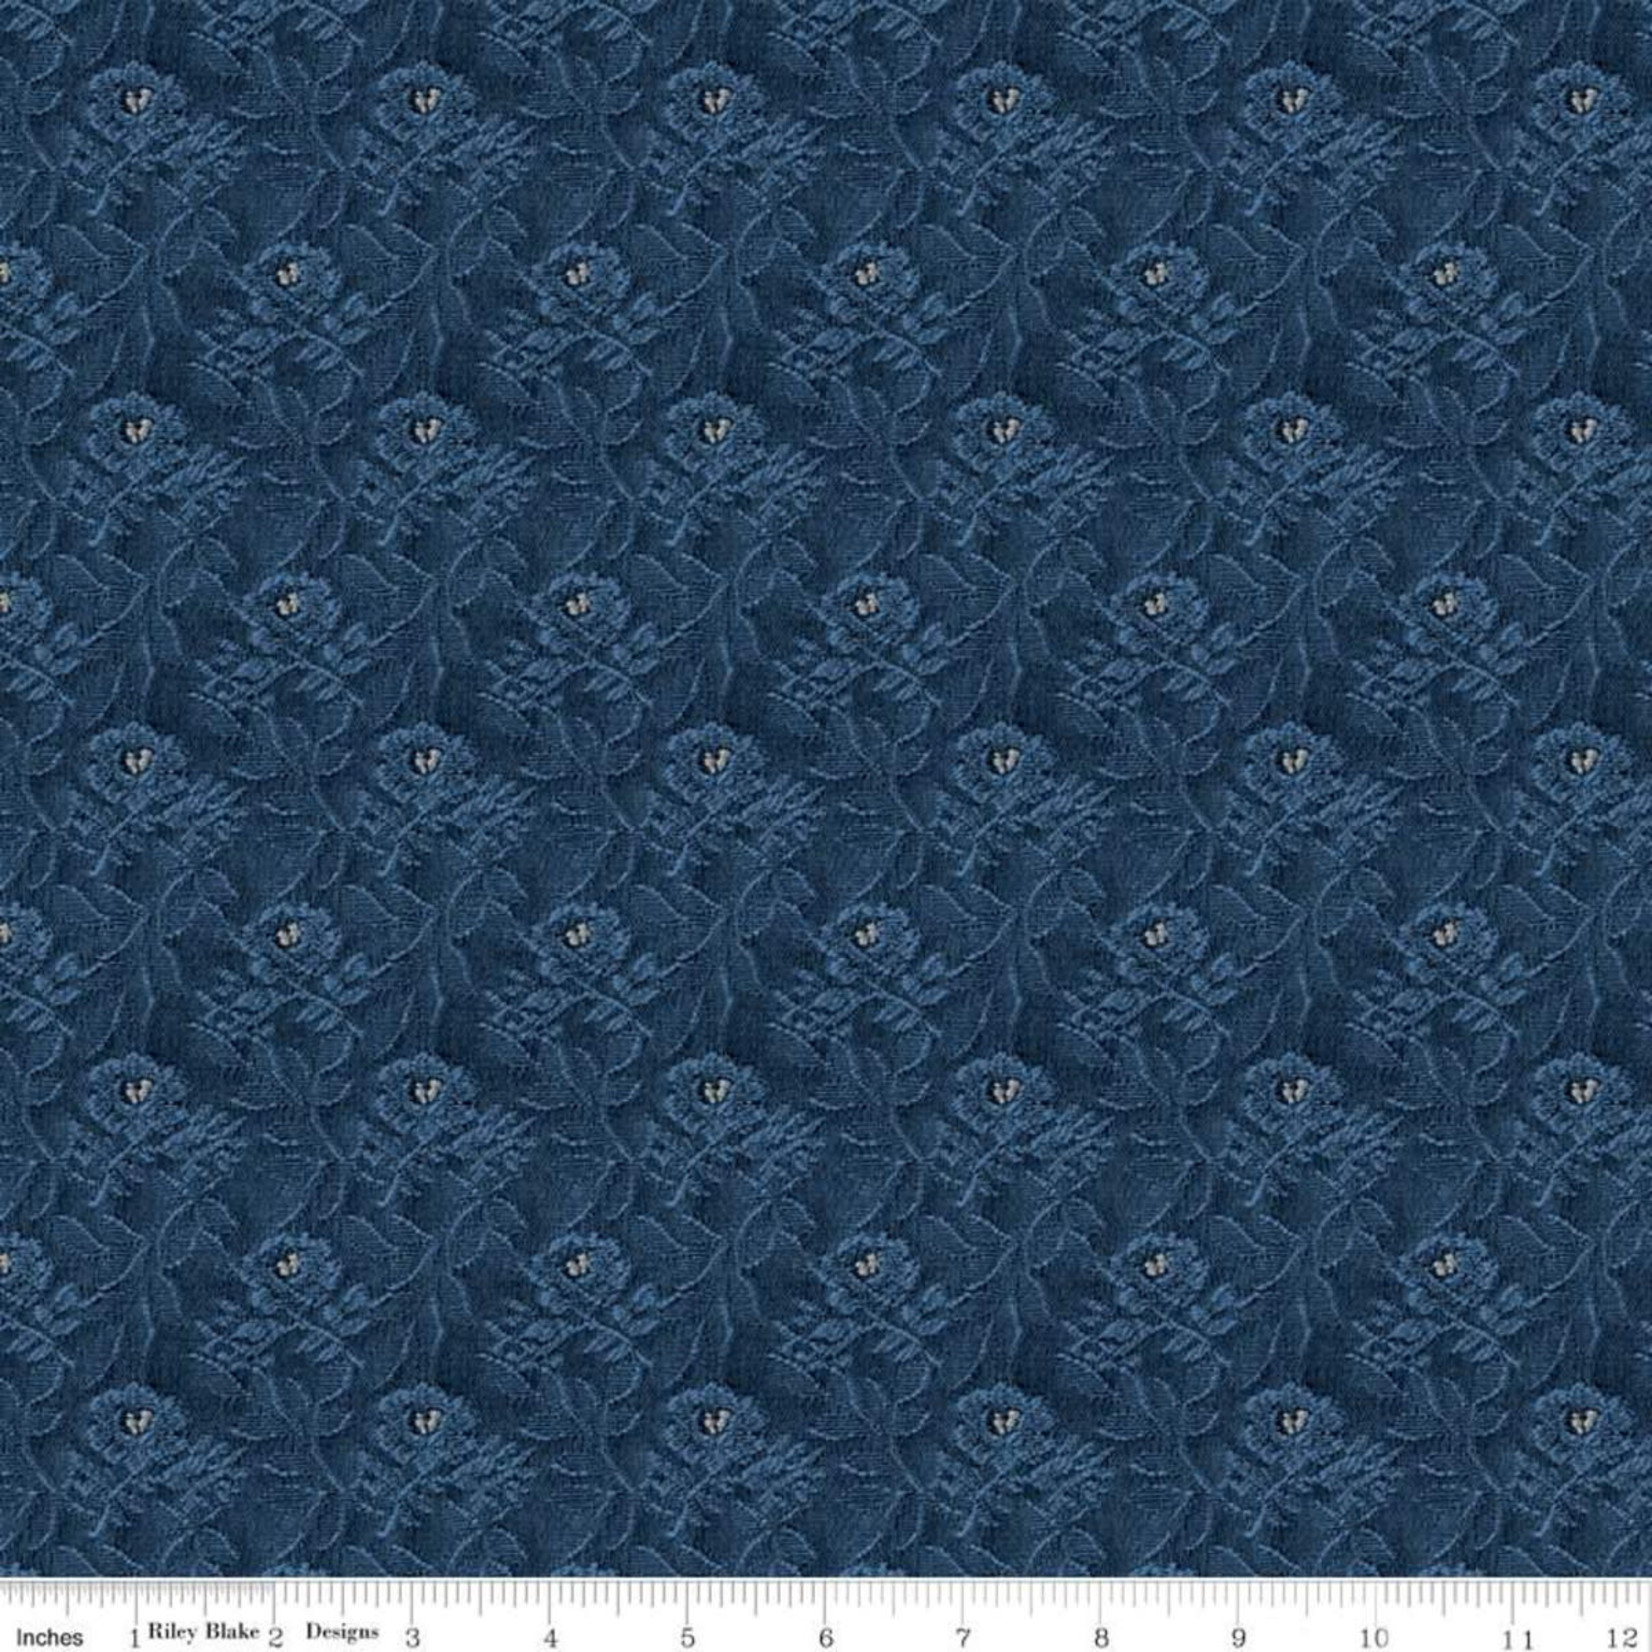 Riley Blake Designs Delightful - Tapestry - Navy